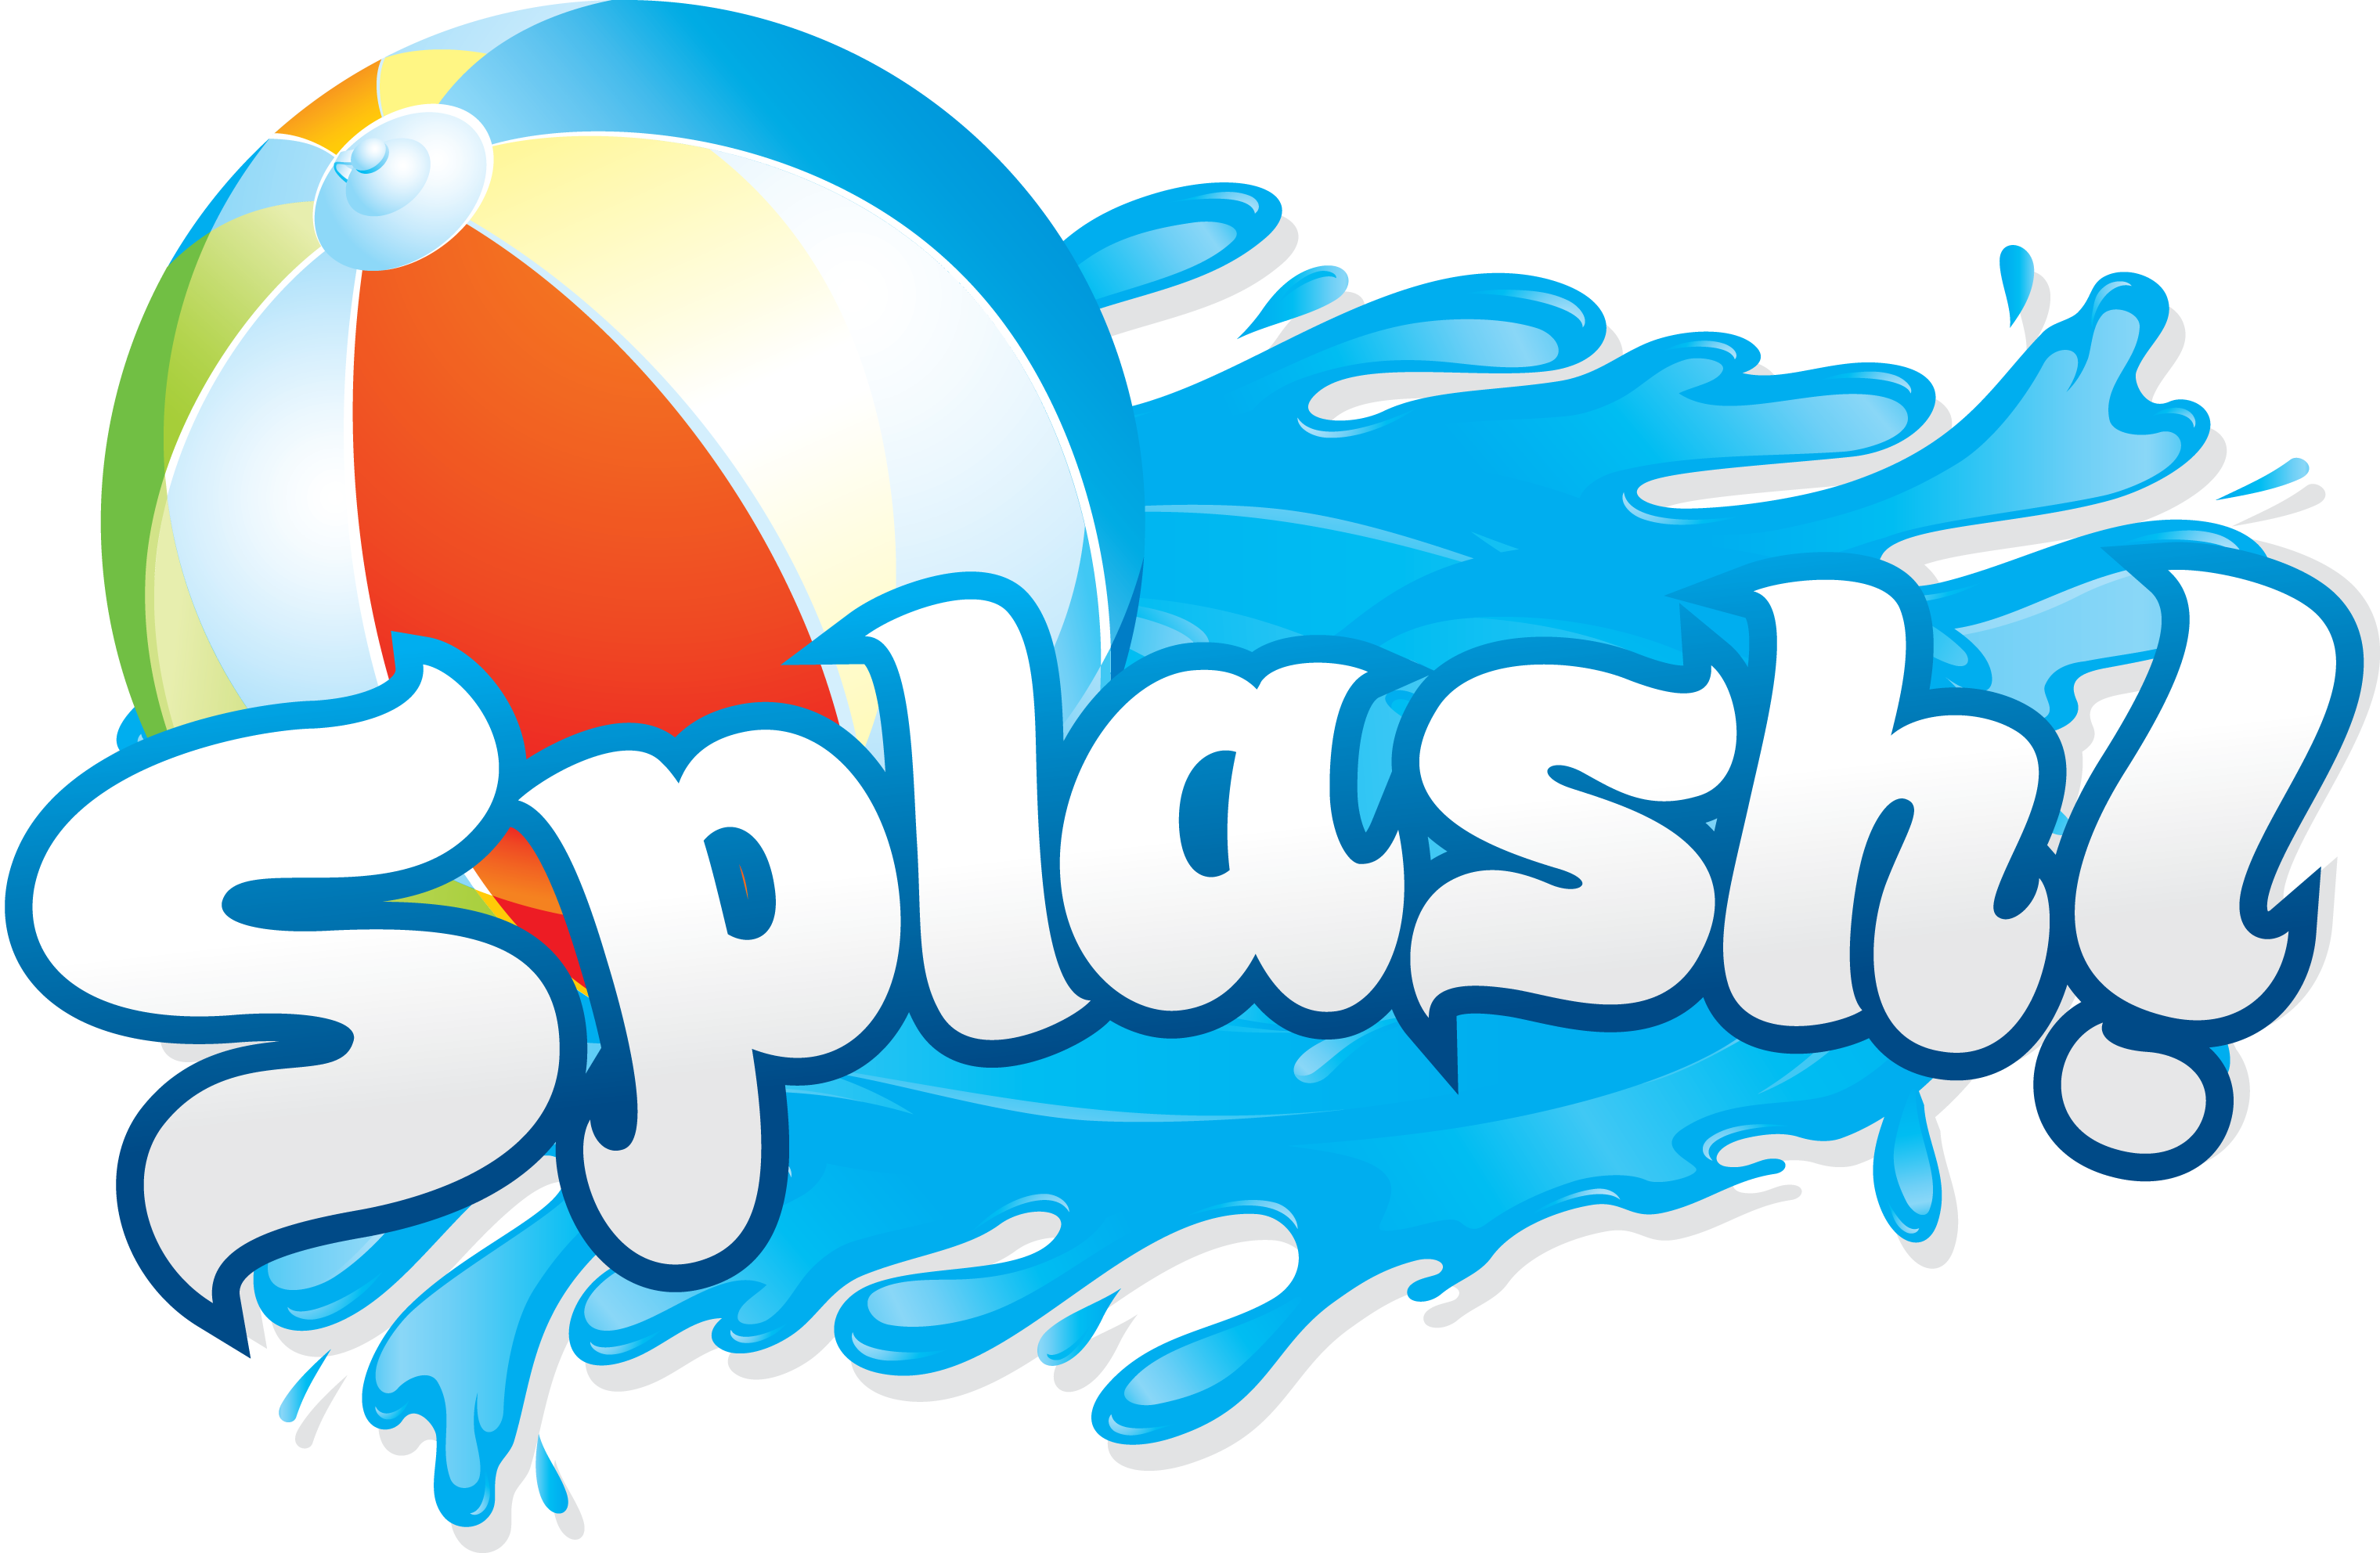 water splash silhouette at getdrawings com free for personal use rh getdrawings com water splash day clip art free clipart water splash